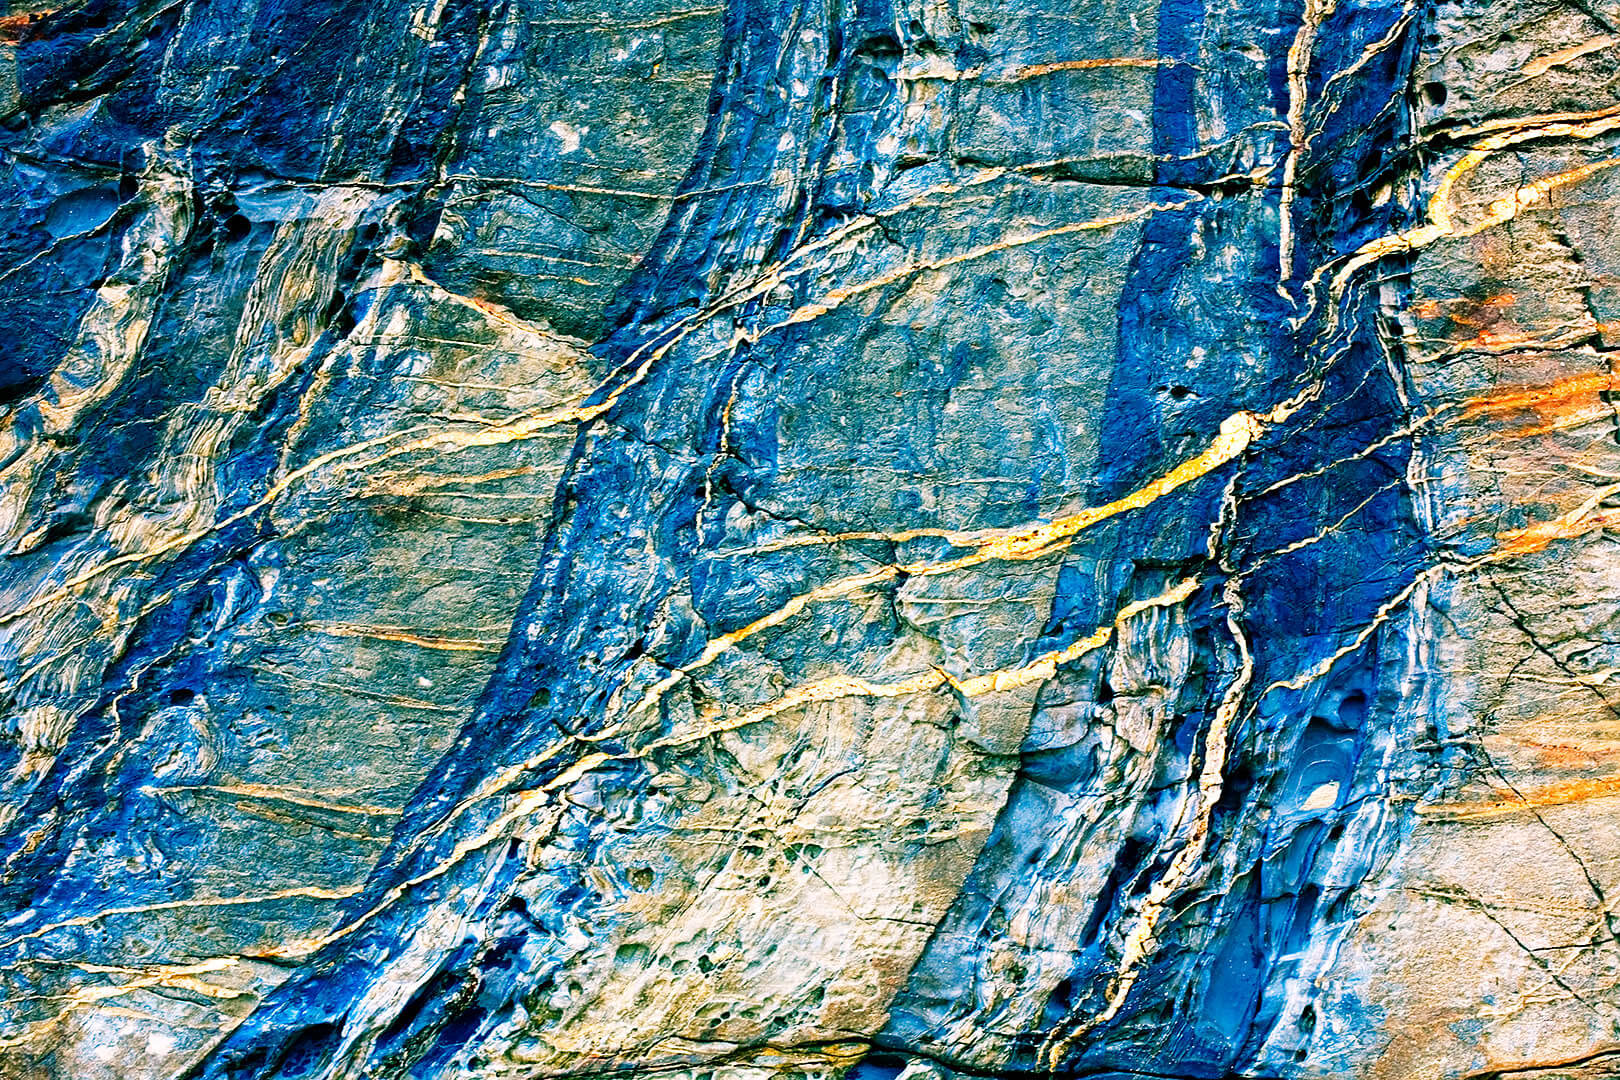 Hayle Rock Patterns 02